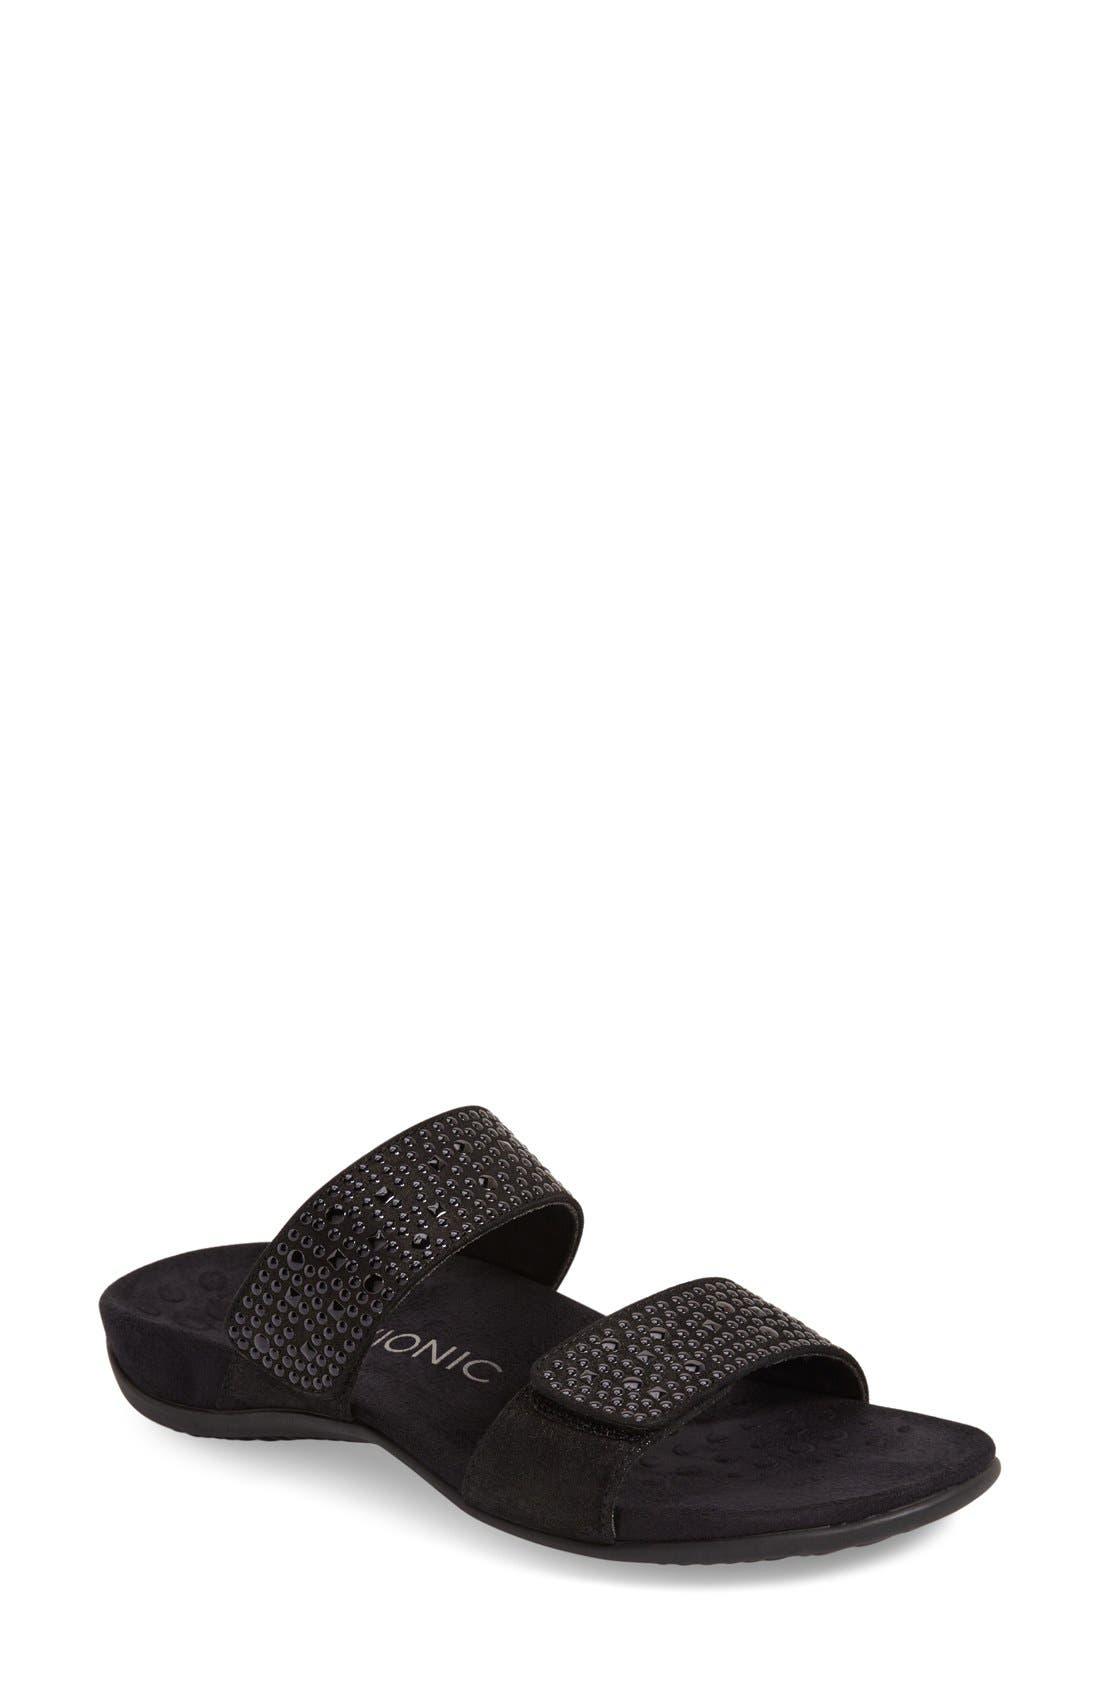 'Samoa' Sandal,                             Main thumbnail 1, color,                             Black Leather